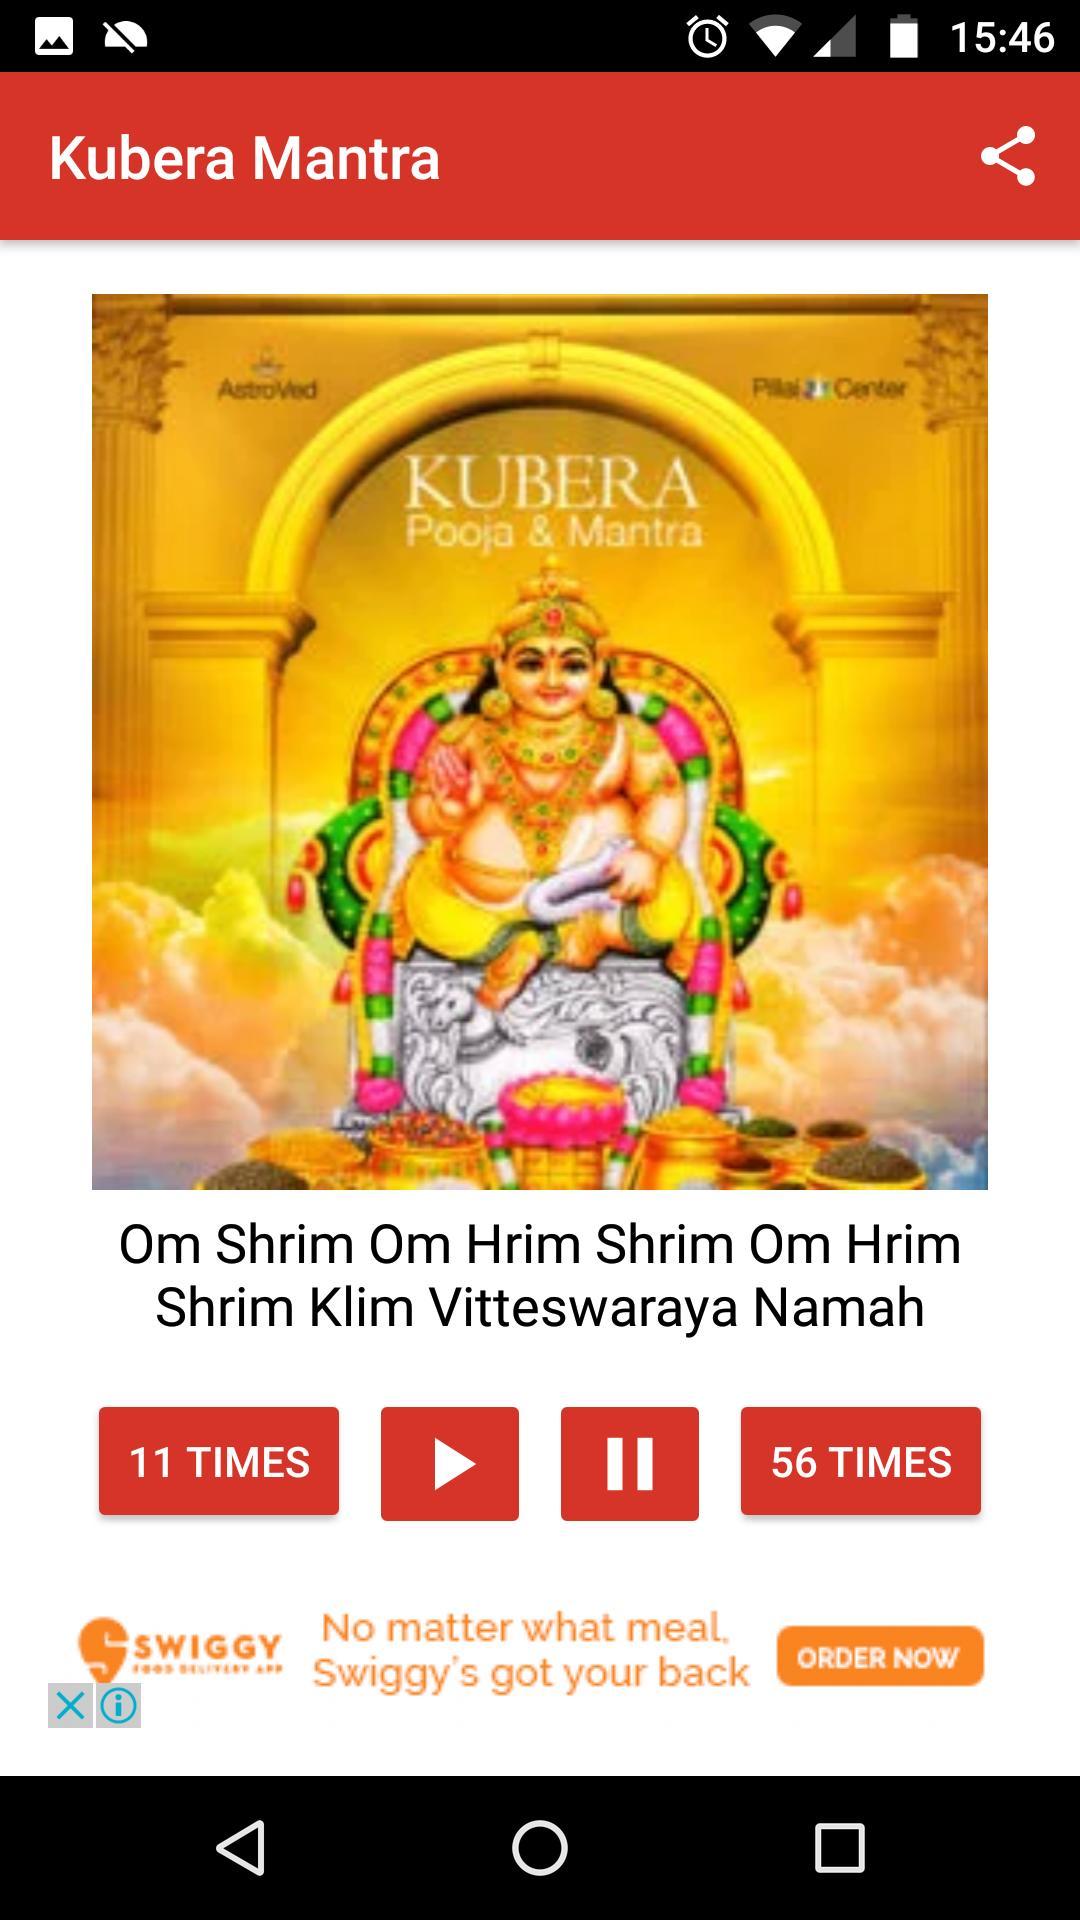 Laxmi Kubera Mantra | Money Mantra | Kuber Mantra for